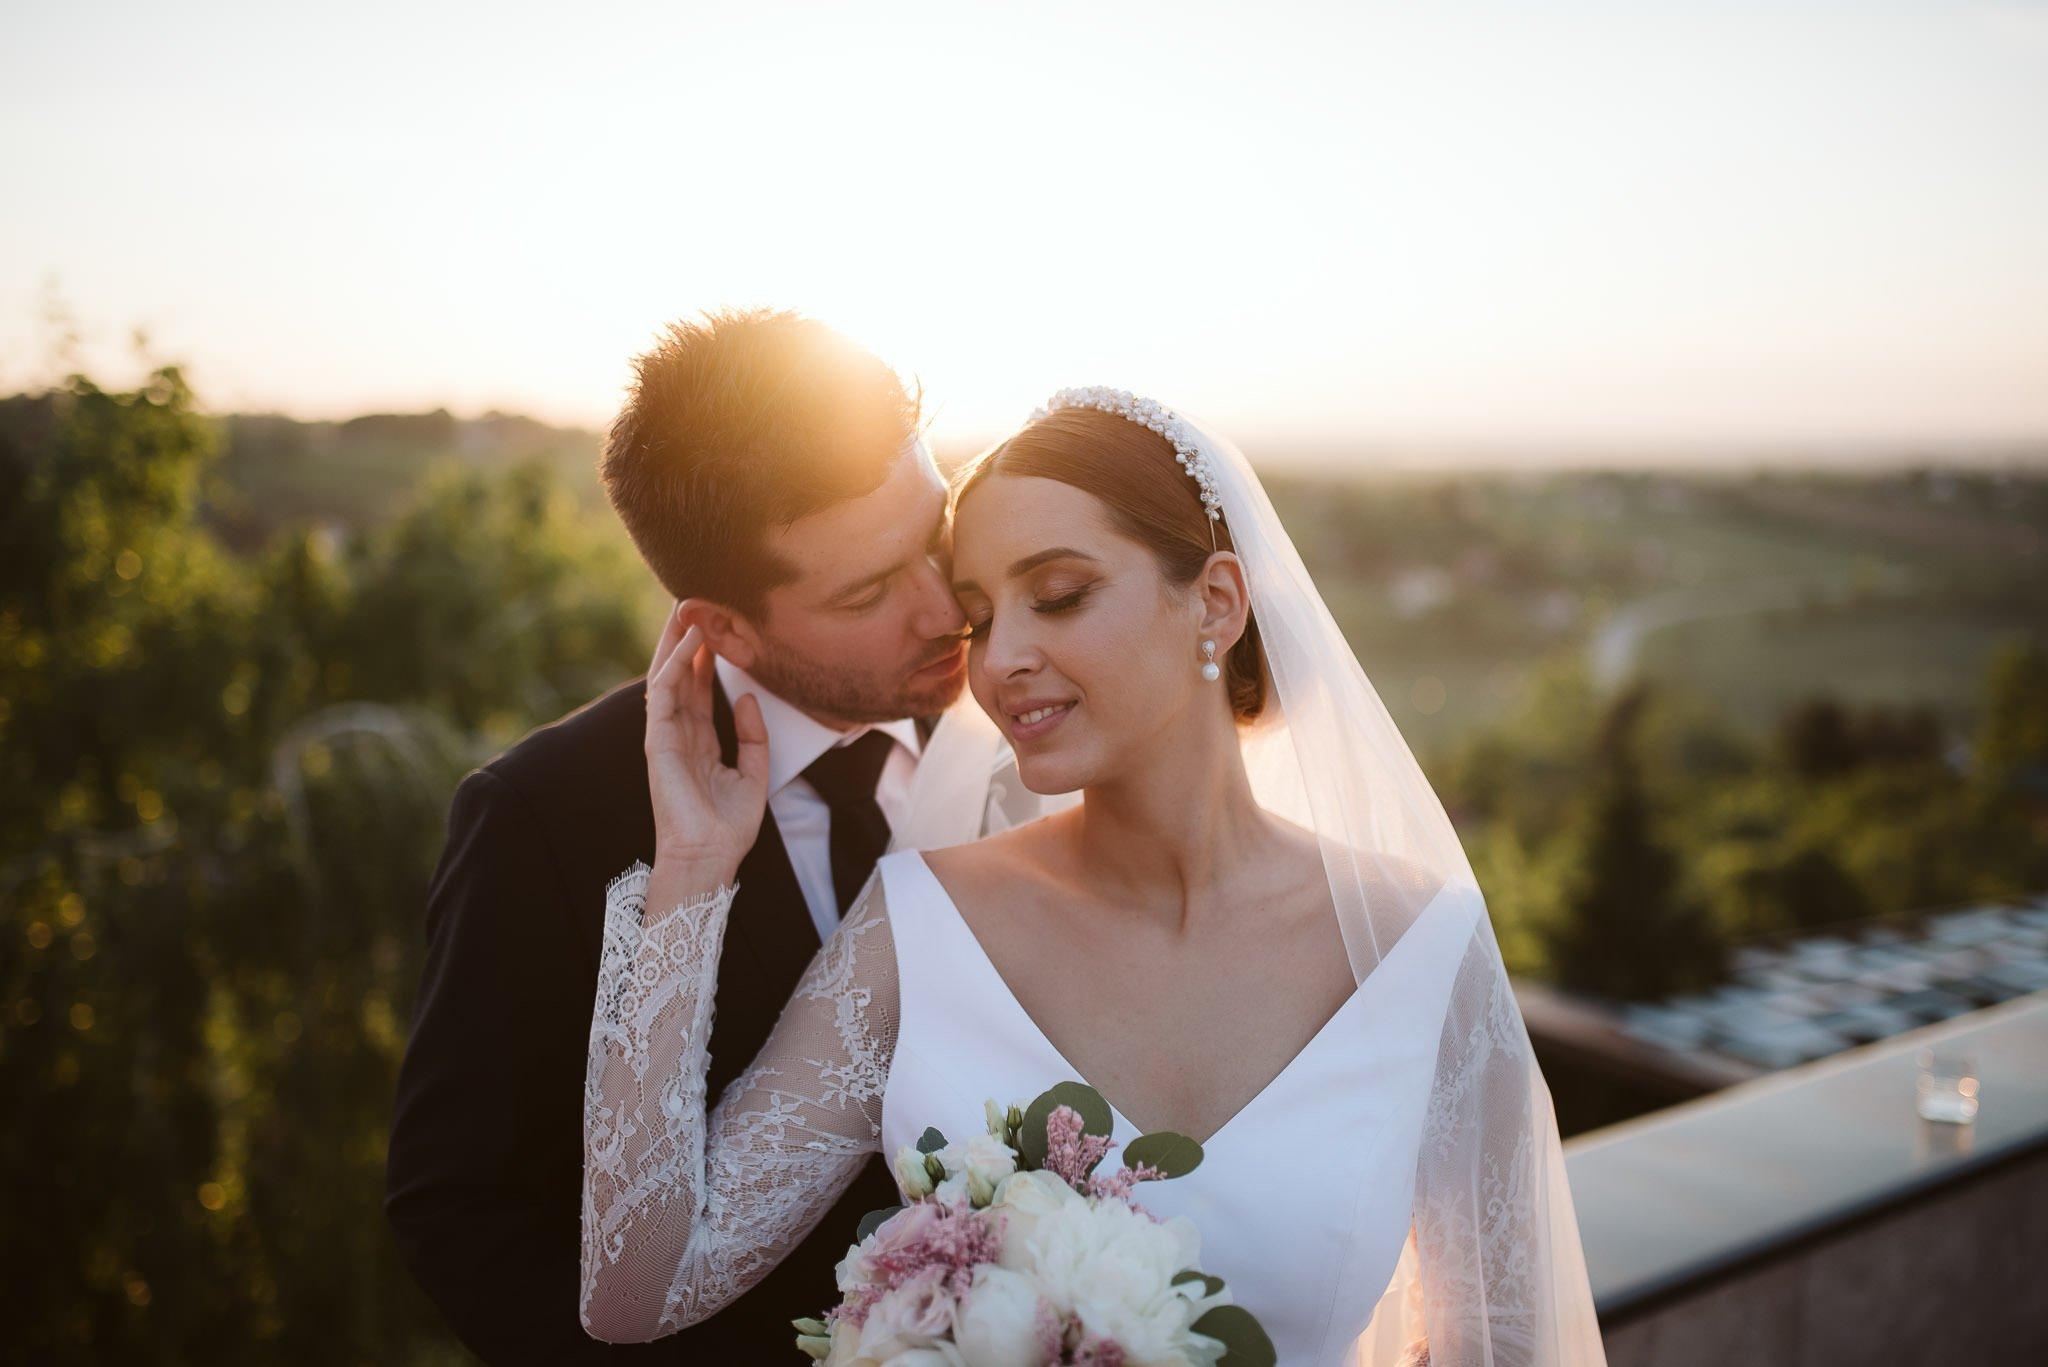 Bride posing next to an old church Petrovaradin, Novi Sad, Serbia